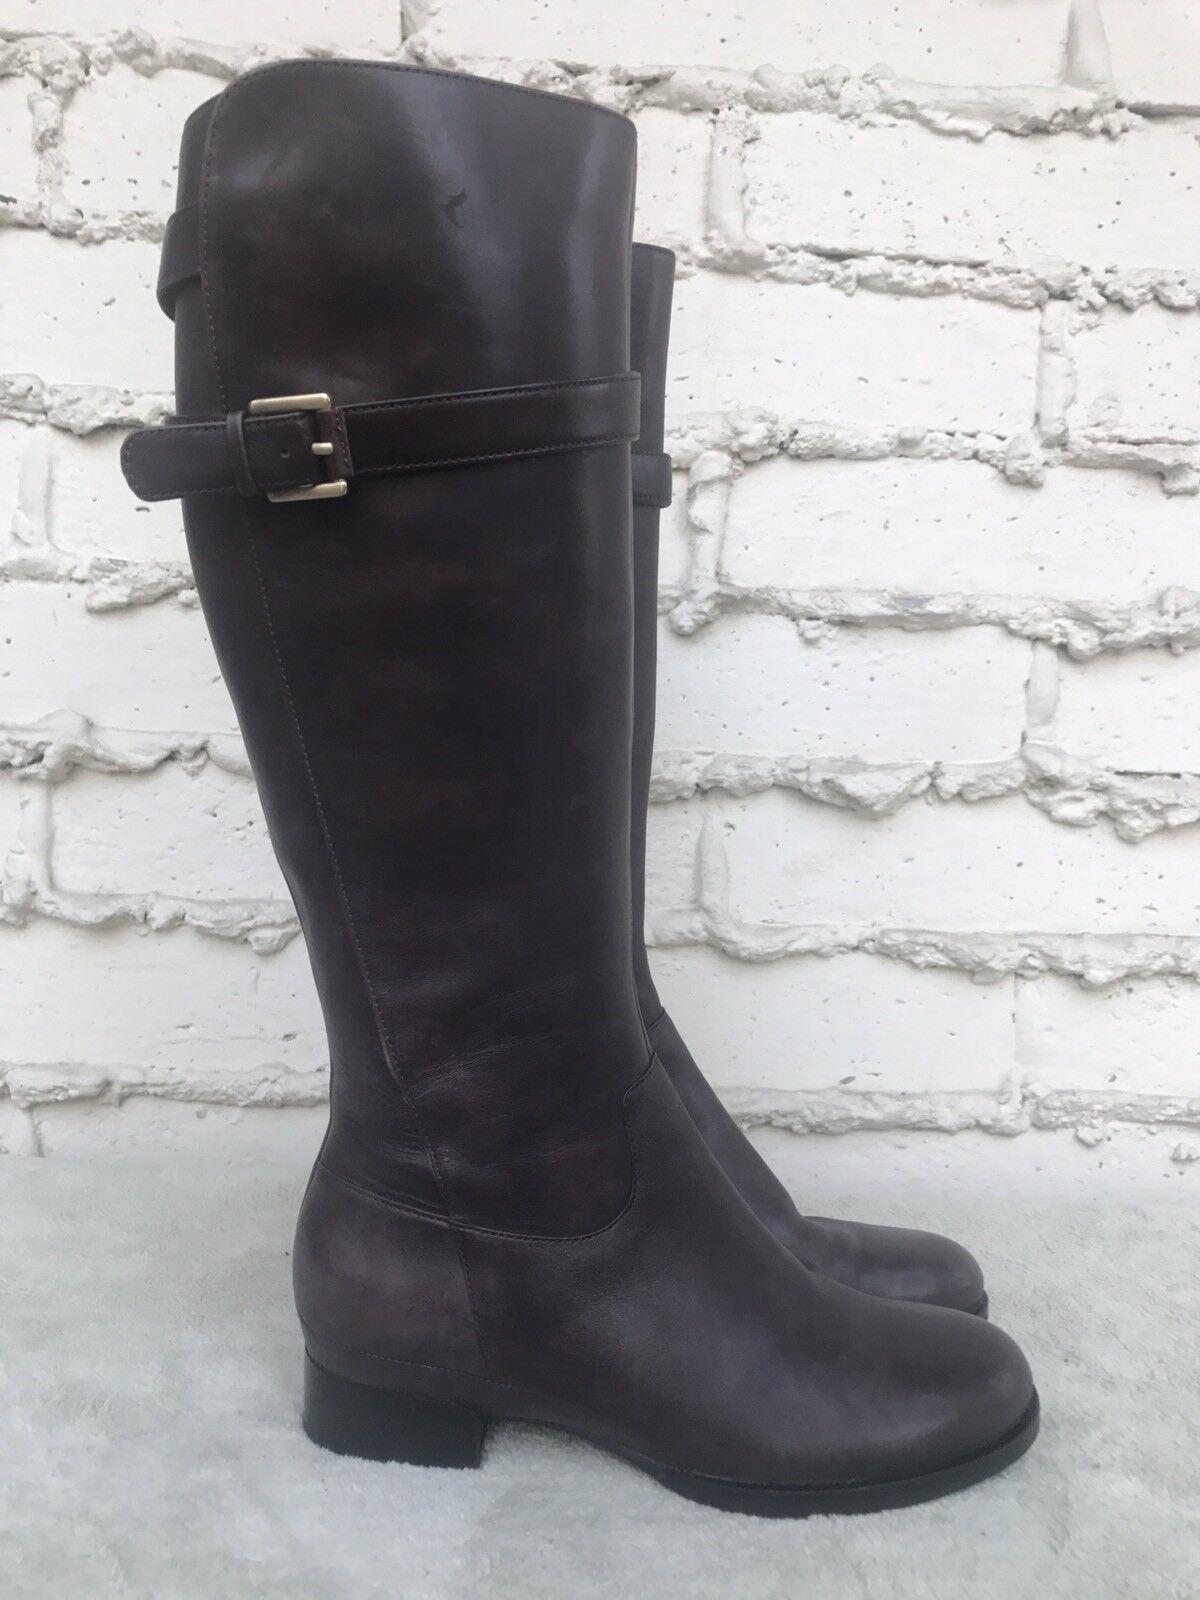 Excelente condición usada mujeres Ecco Cuero Marrón Oscuro Rodilla alta botas de Montar US